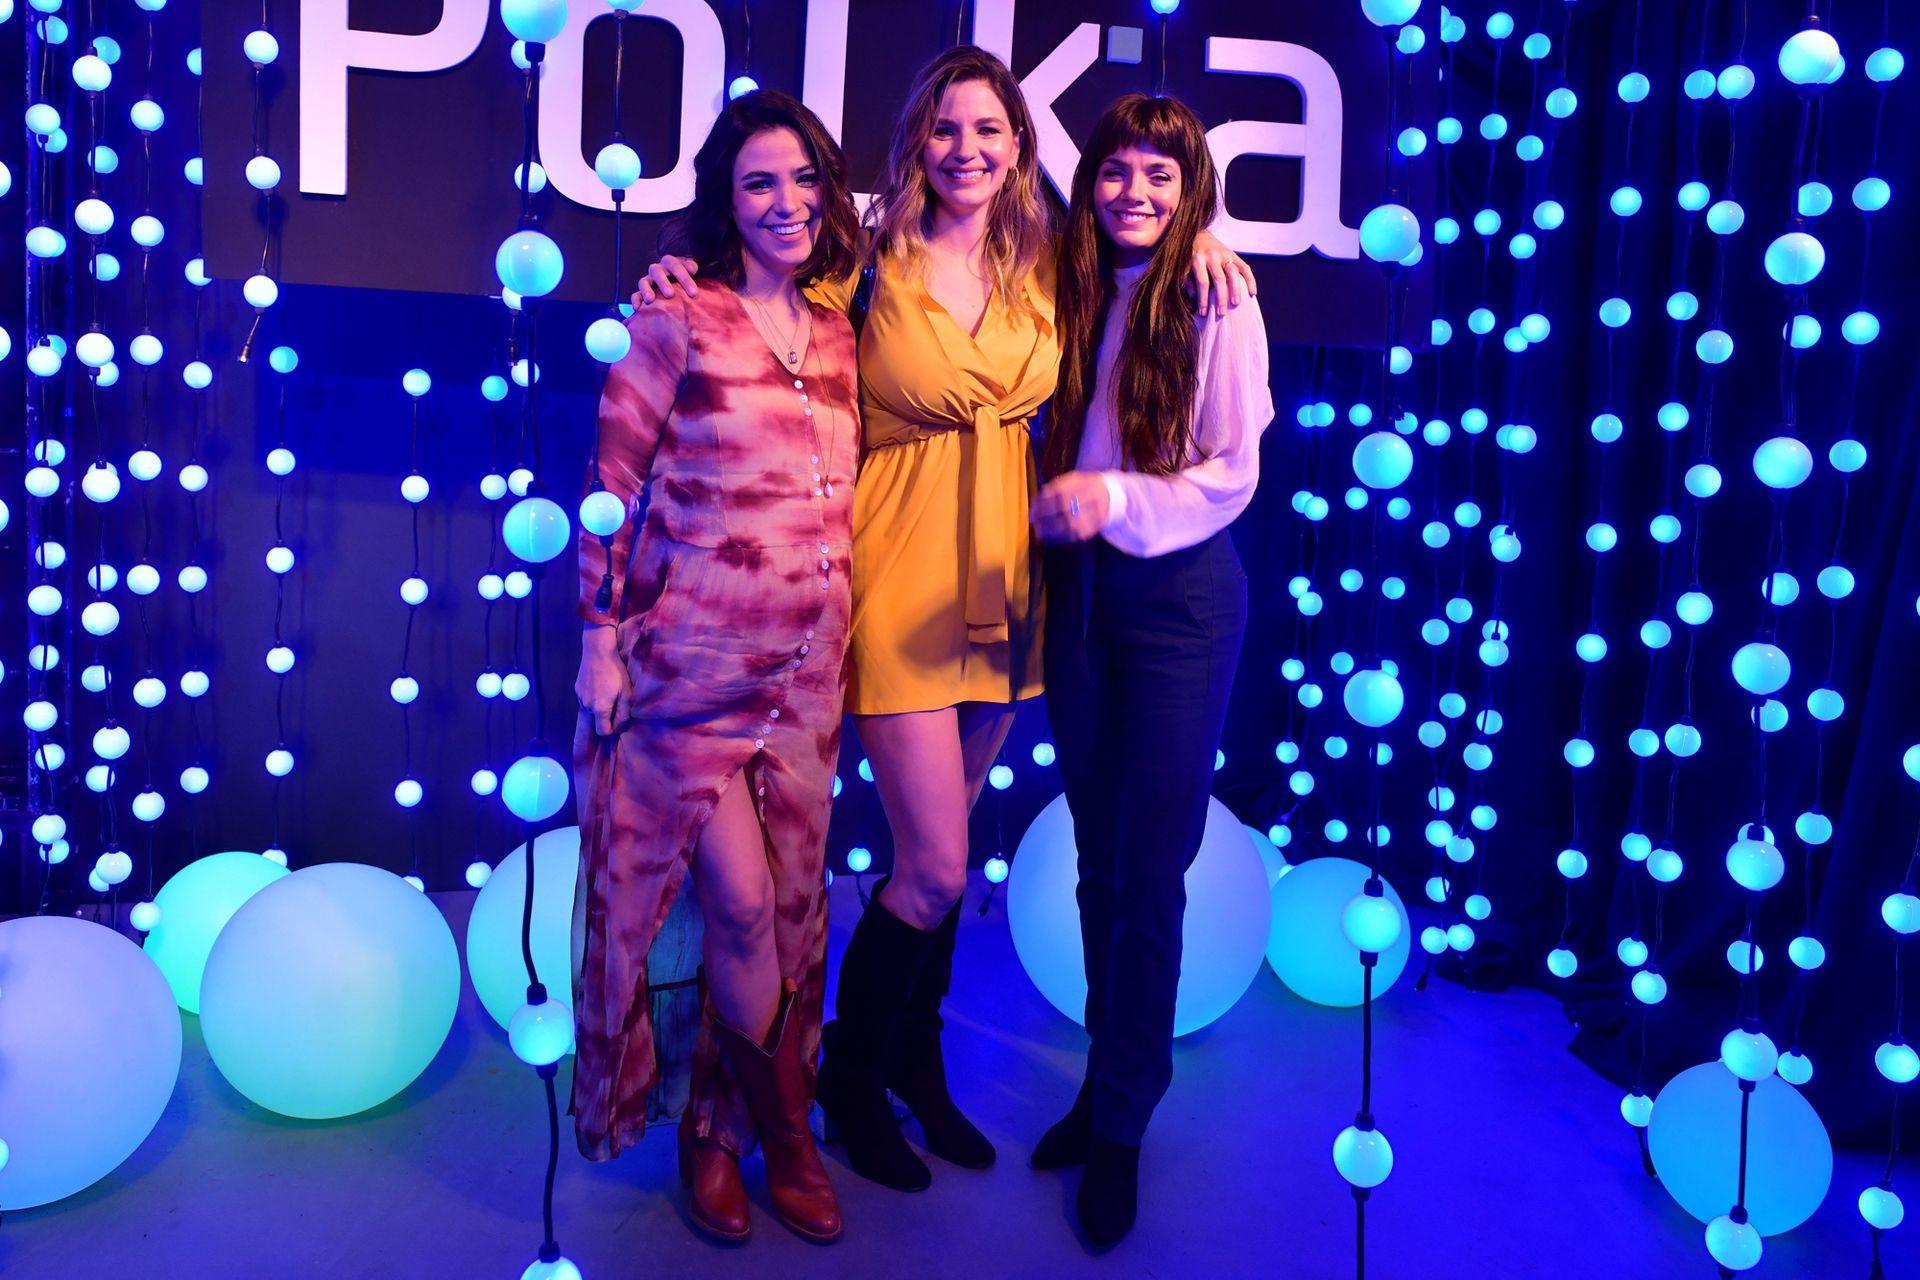 Agustina Cherri, Marcela Kloosterboer y Natalie Pérez